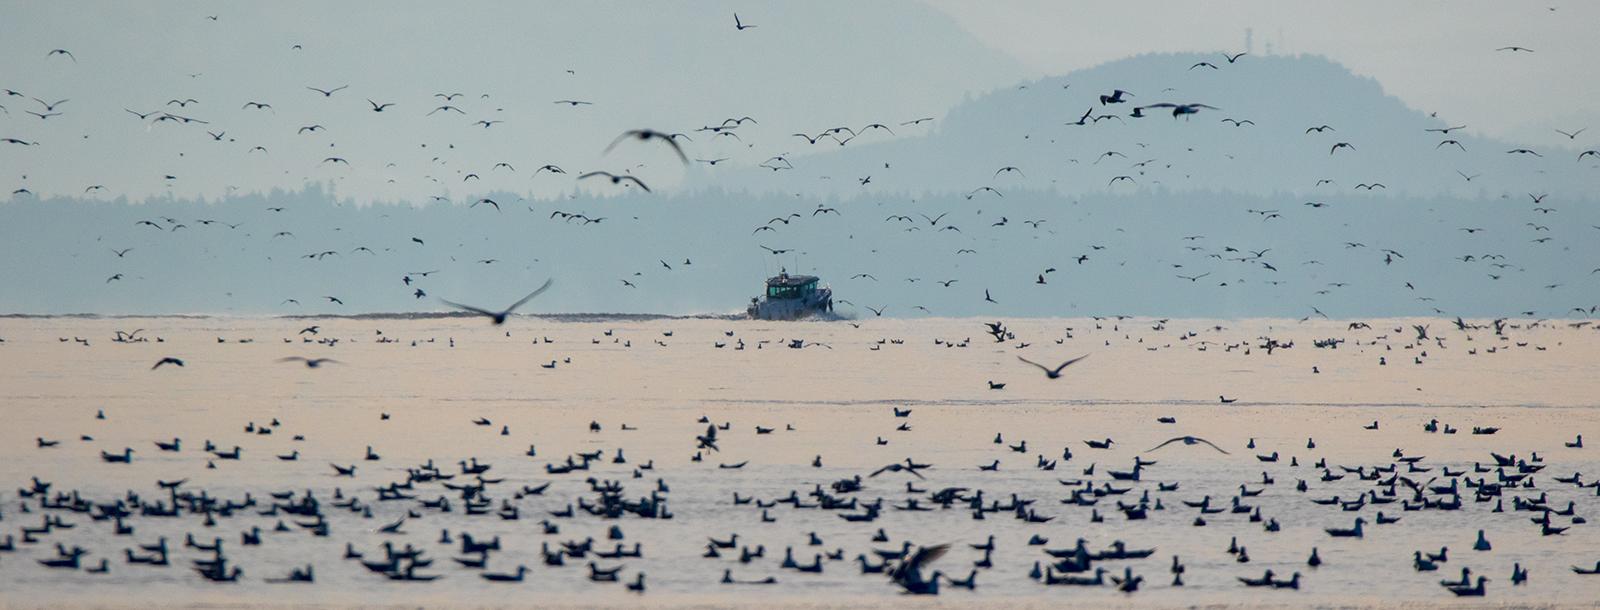 Seagulls mass in Lambrt Channel between Hornby and Denman Islands